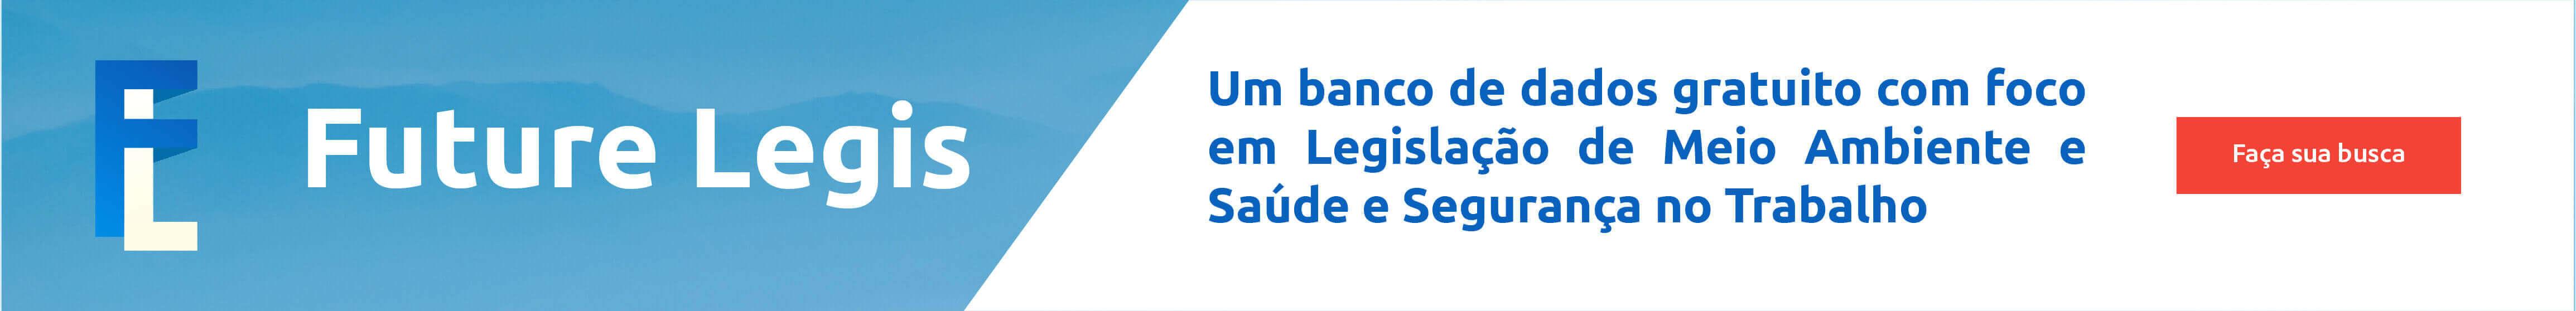 Banner do Site Future Legis - Legislação